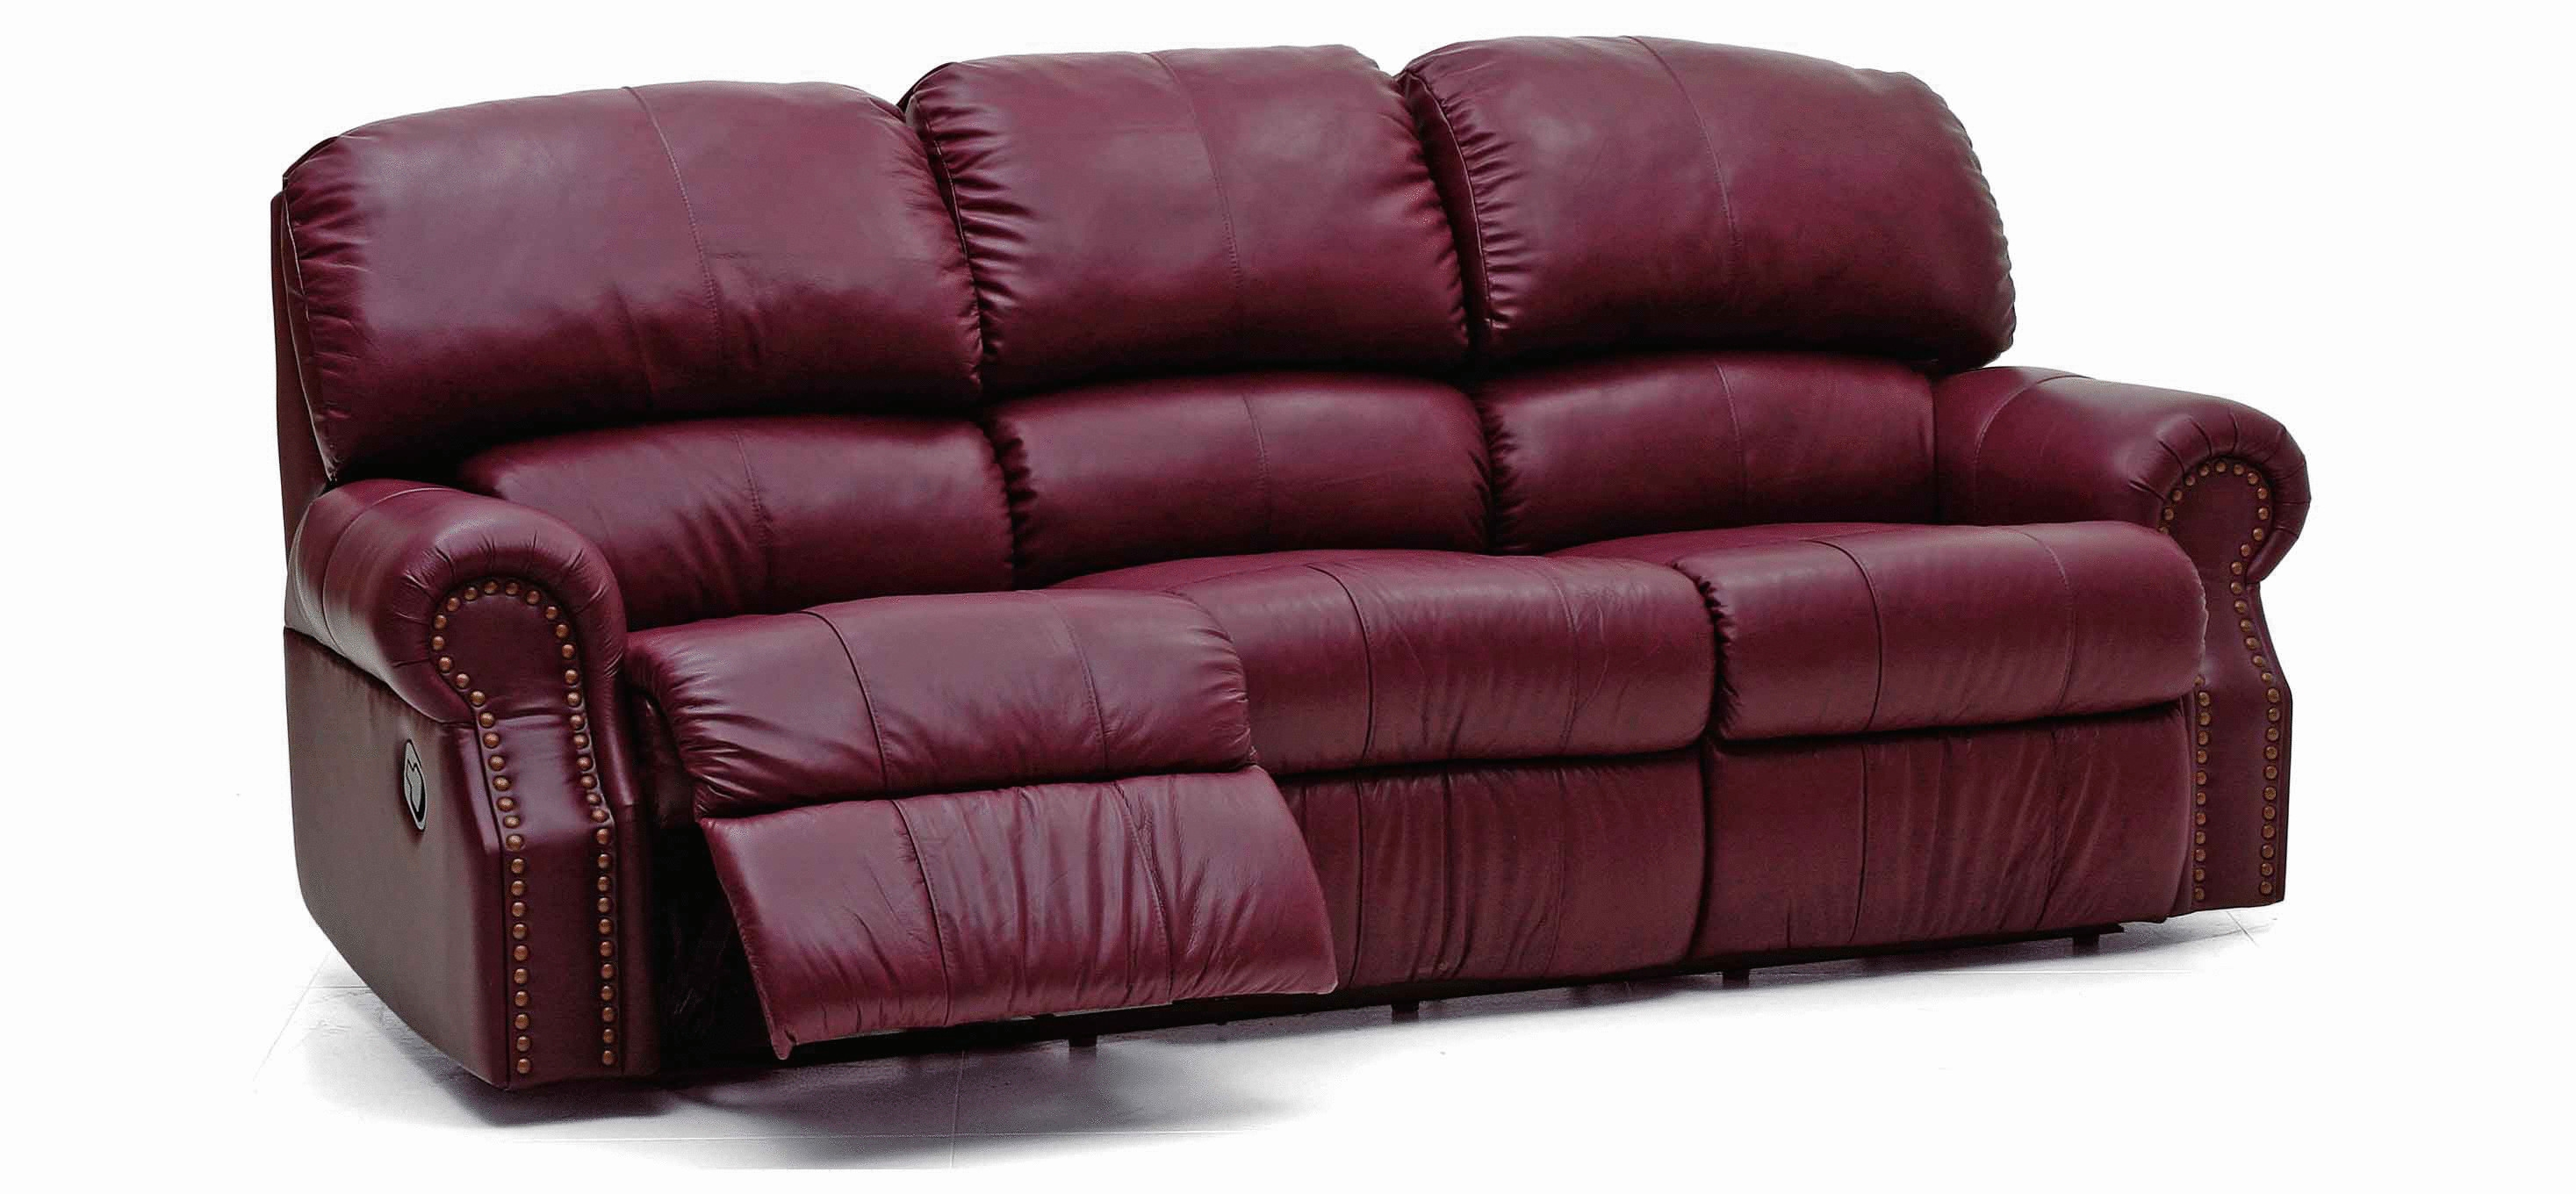 berkline recliner sofa upholstery fabric mumbai home the honoroak